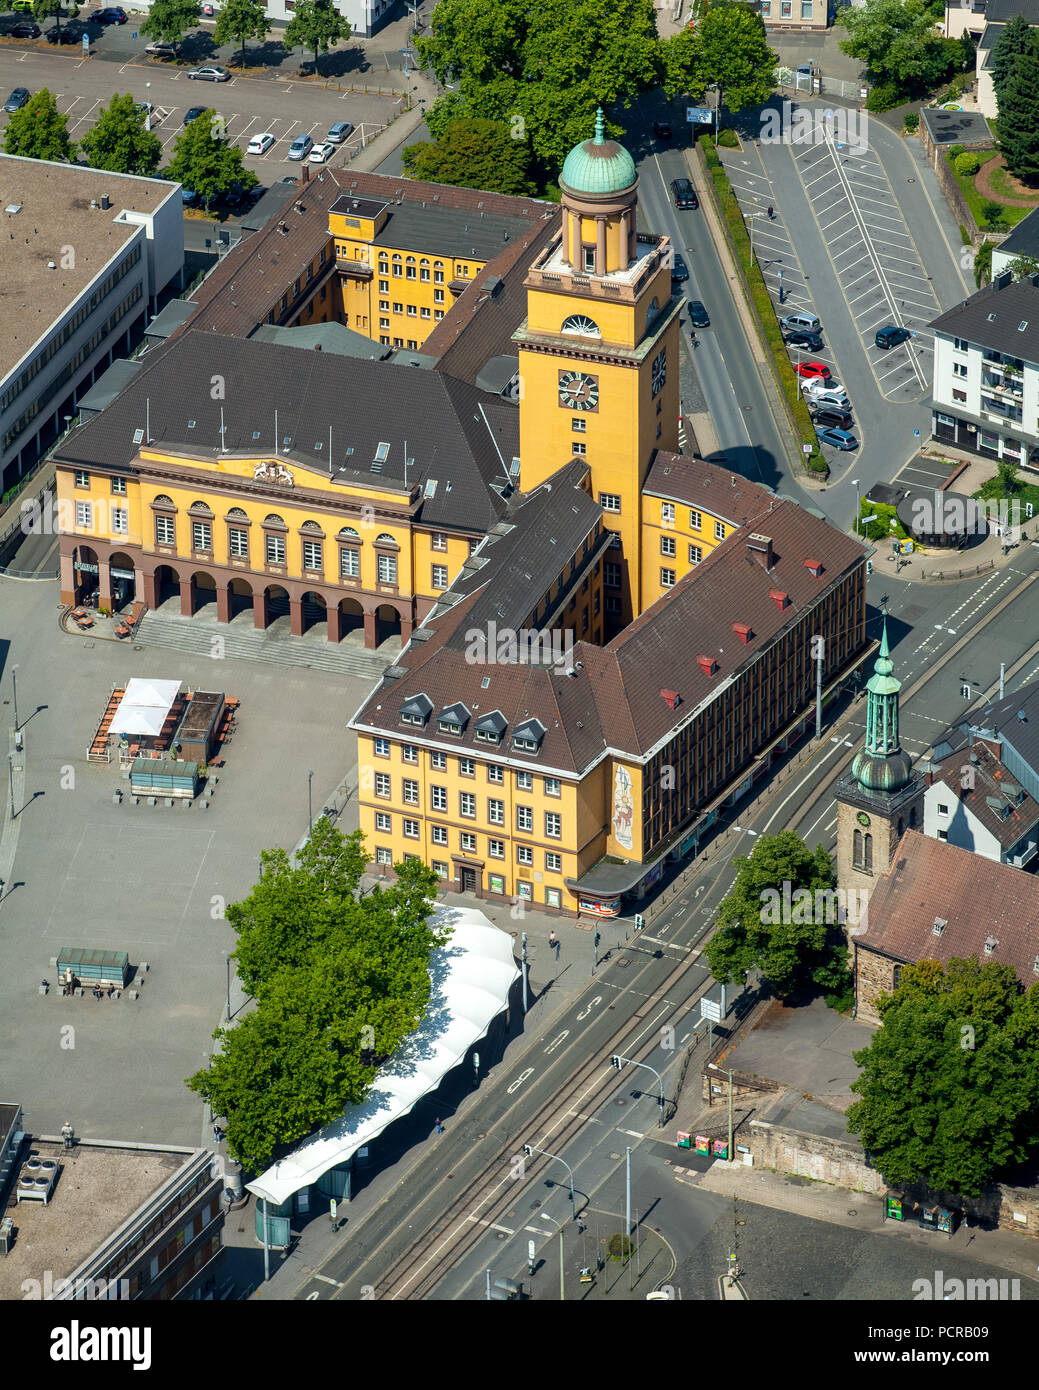 Townhall Witten, Witten, Ruhr area, North Rhine-Westphalia, Germany - Stock Image